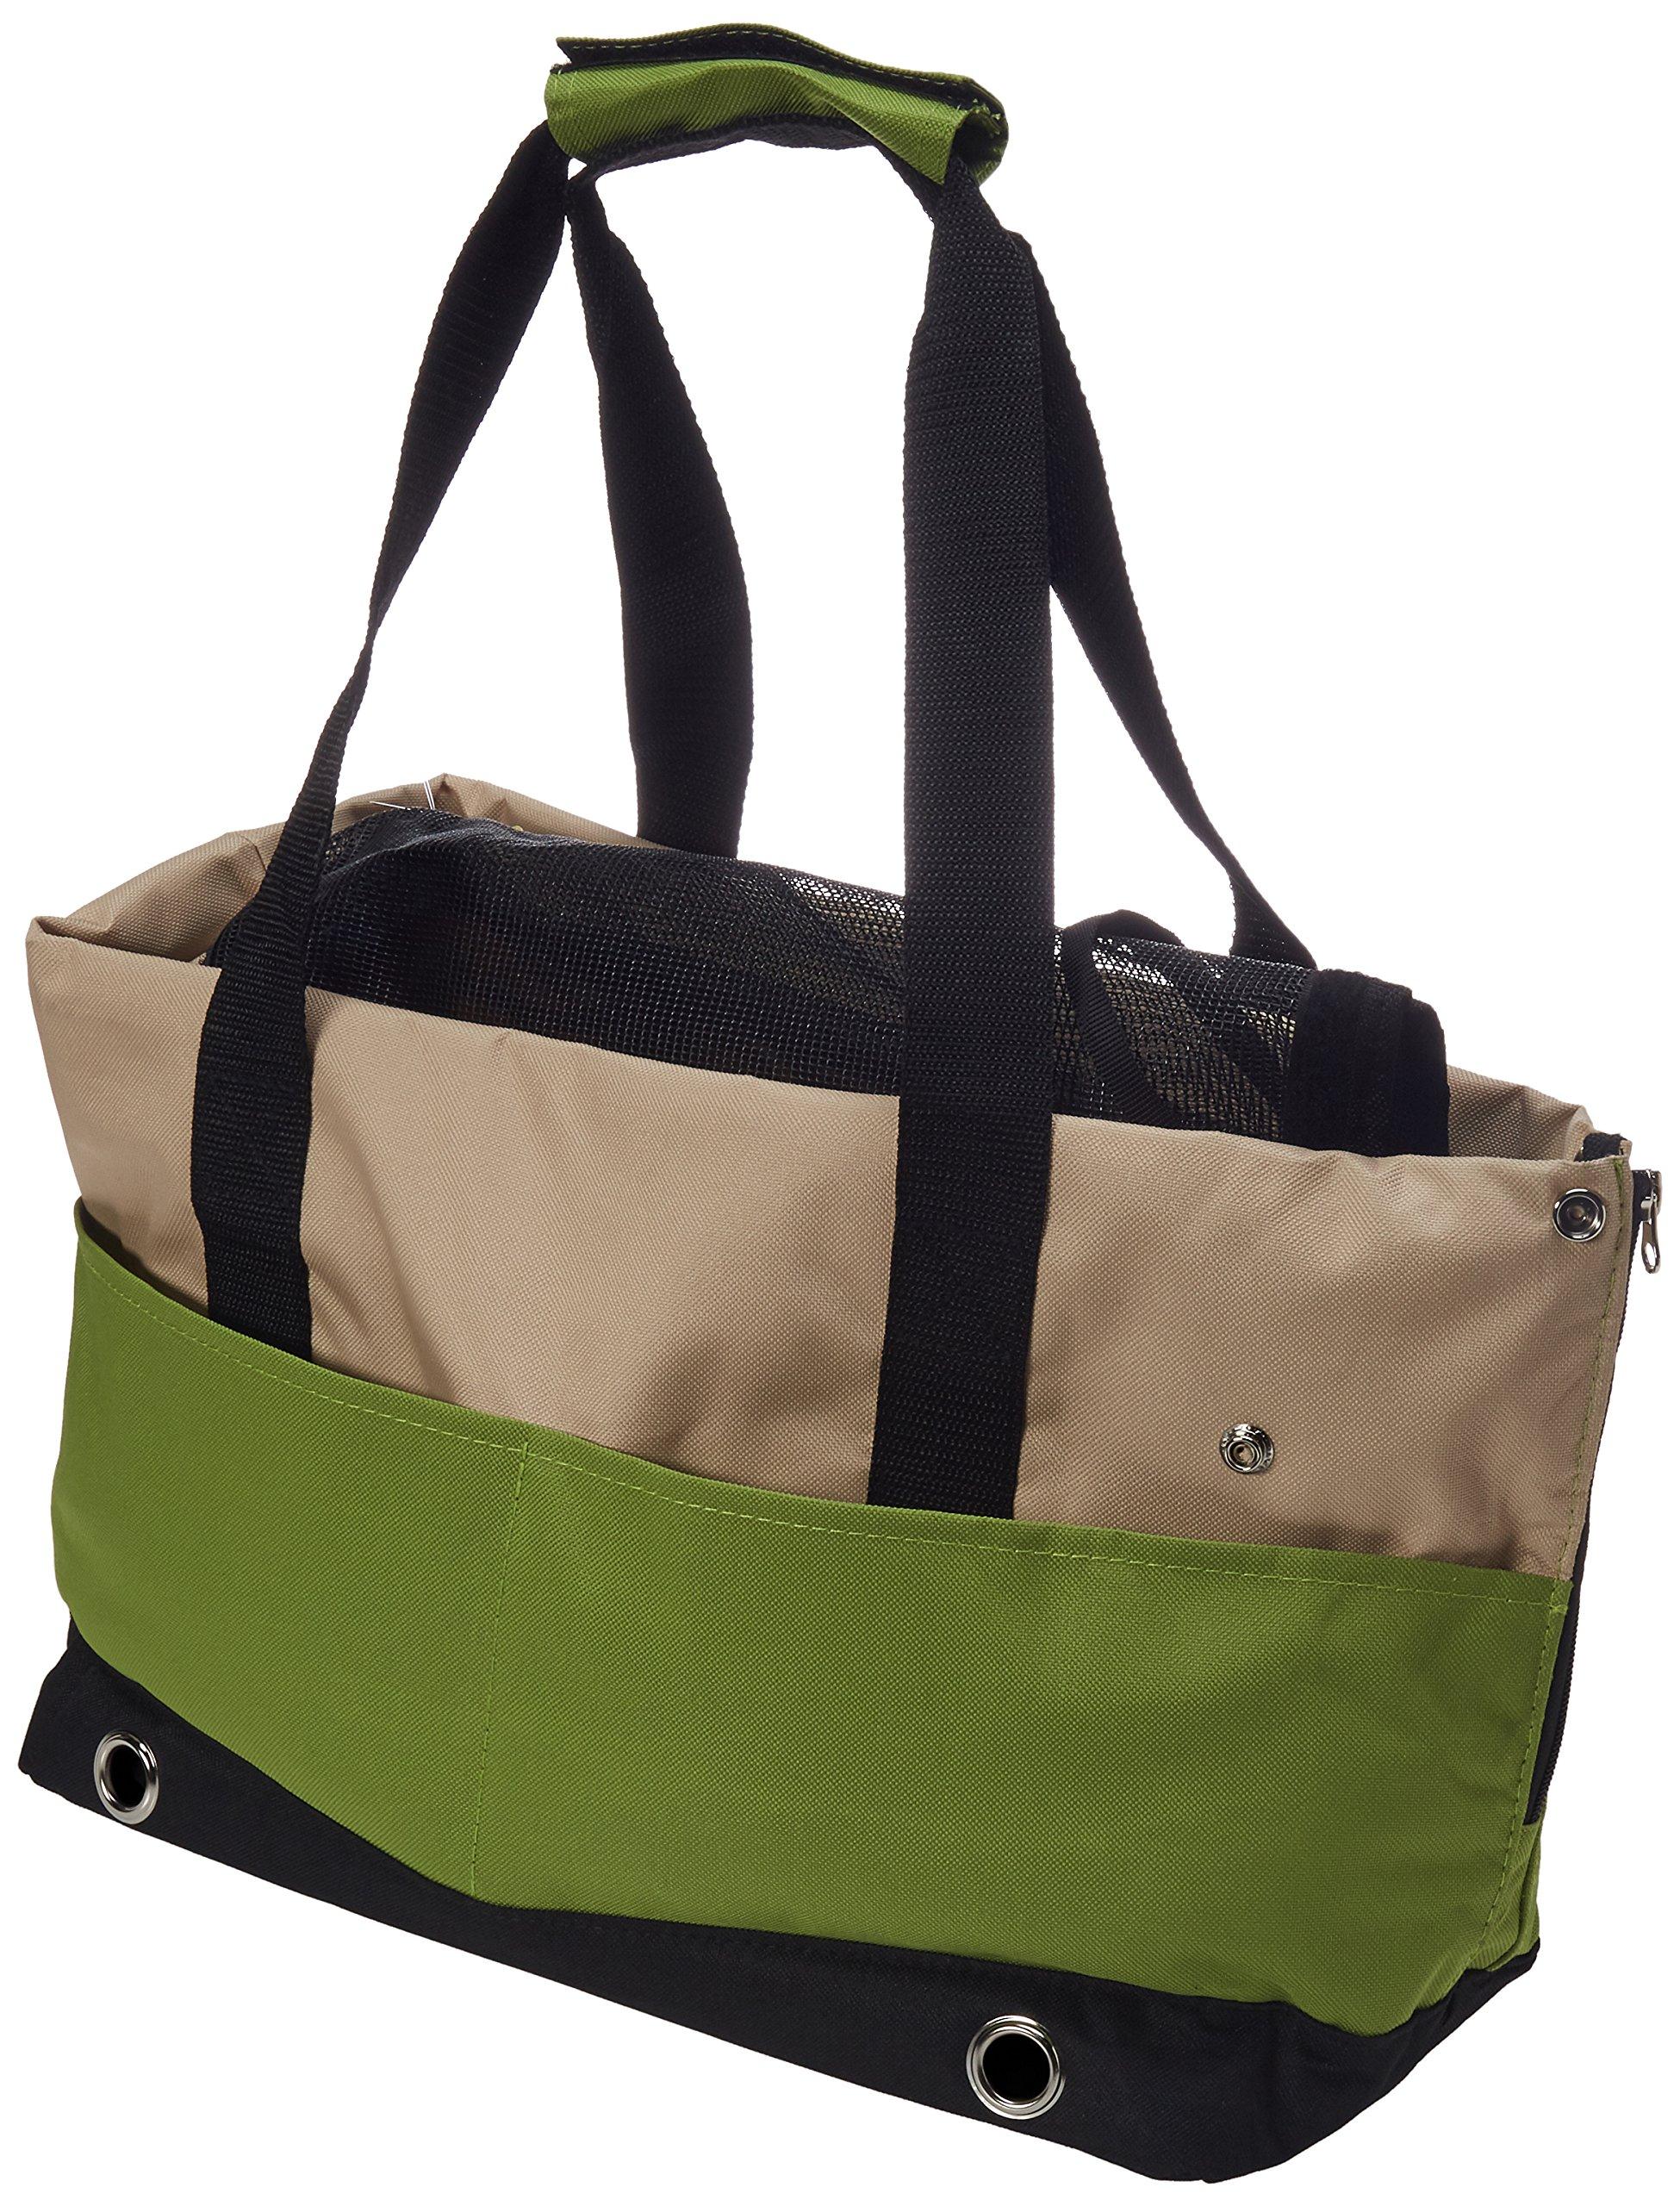 Iconic Pet Furrygo Sports Handbag Carrier, Lime Green